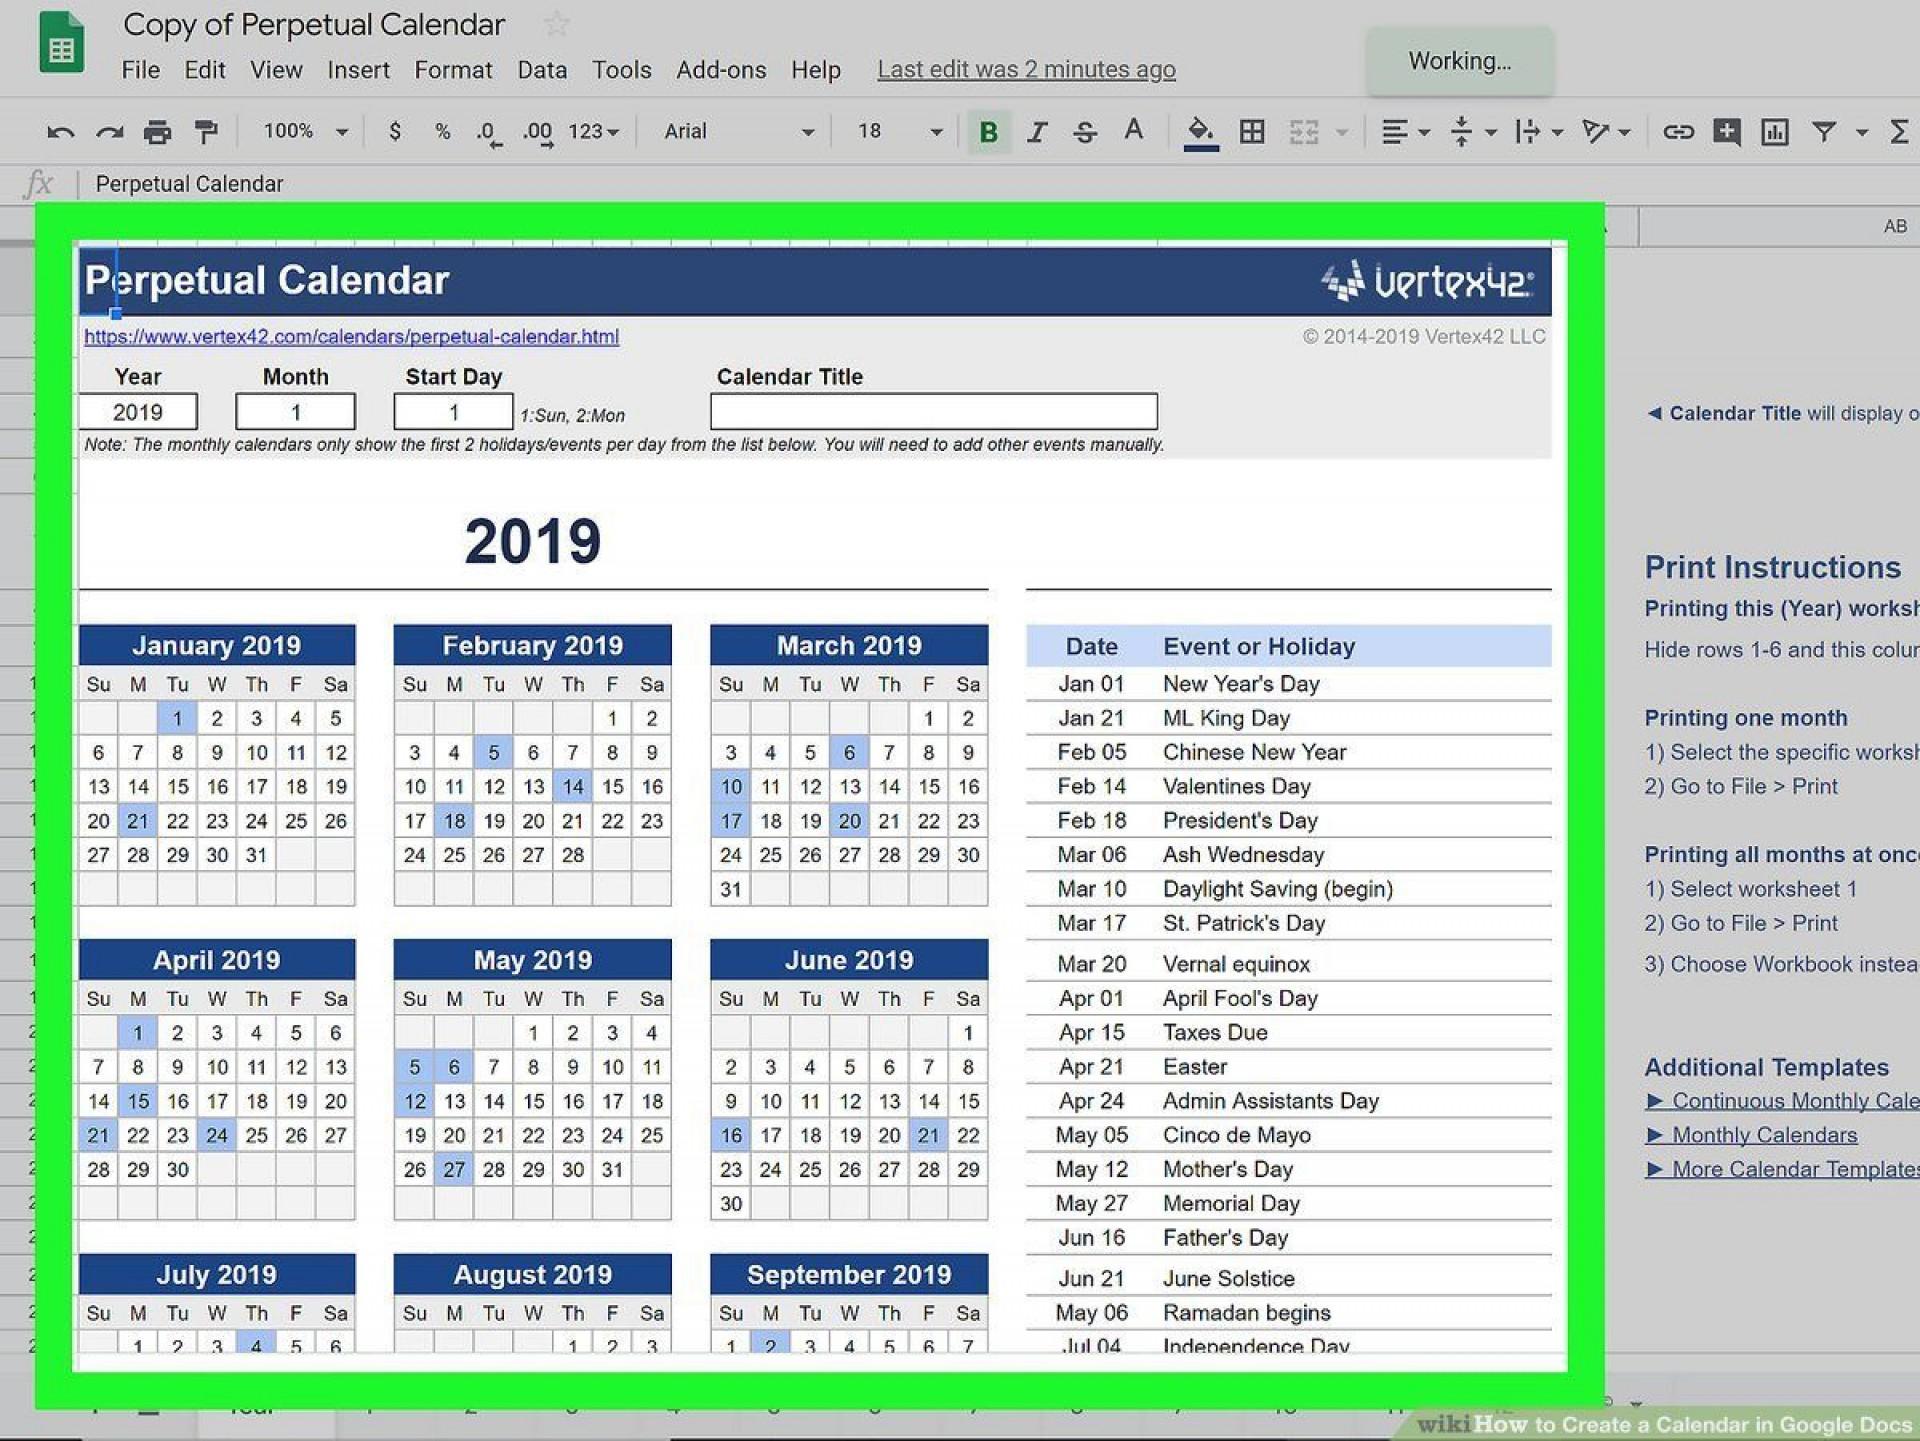 000 Marvelou Google Sheet Calendar Template Design  Templates Monthly Spreadsheet 2020 20181920